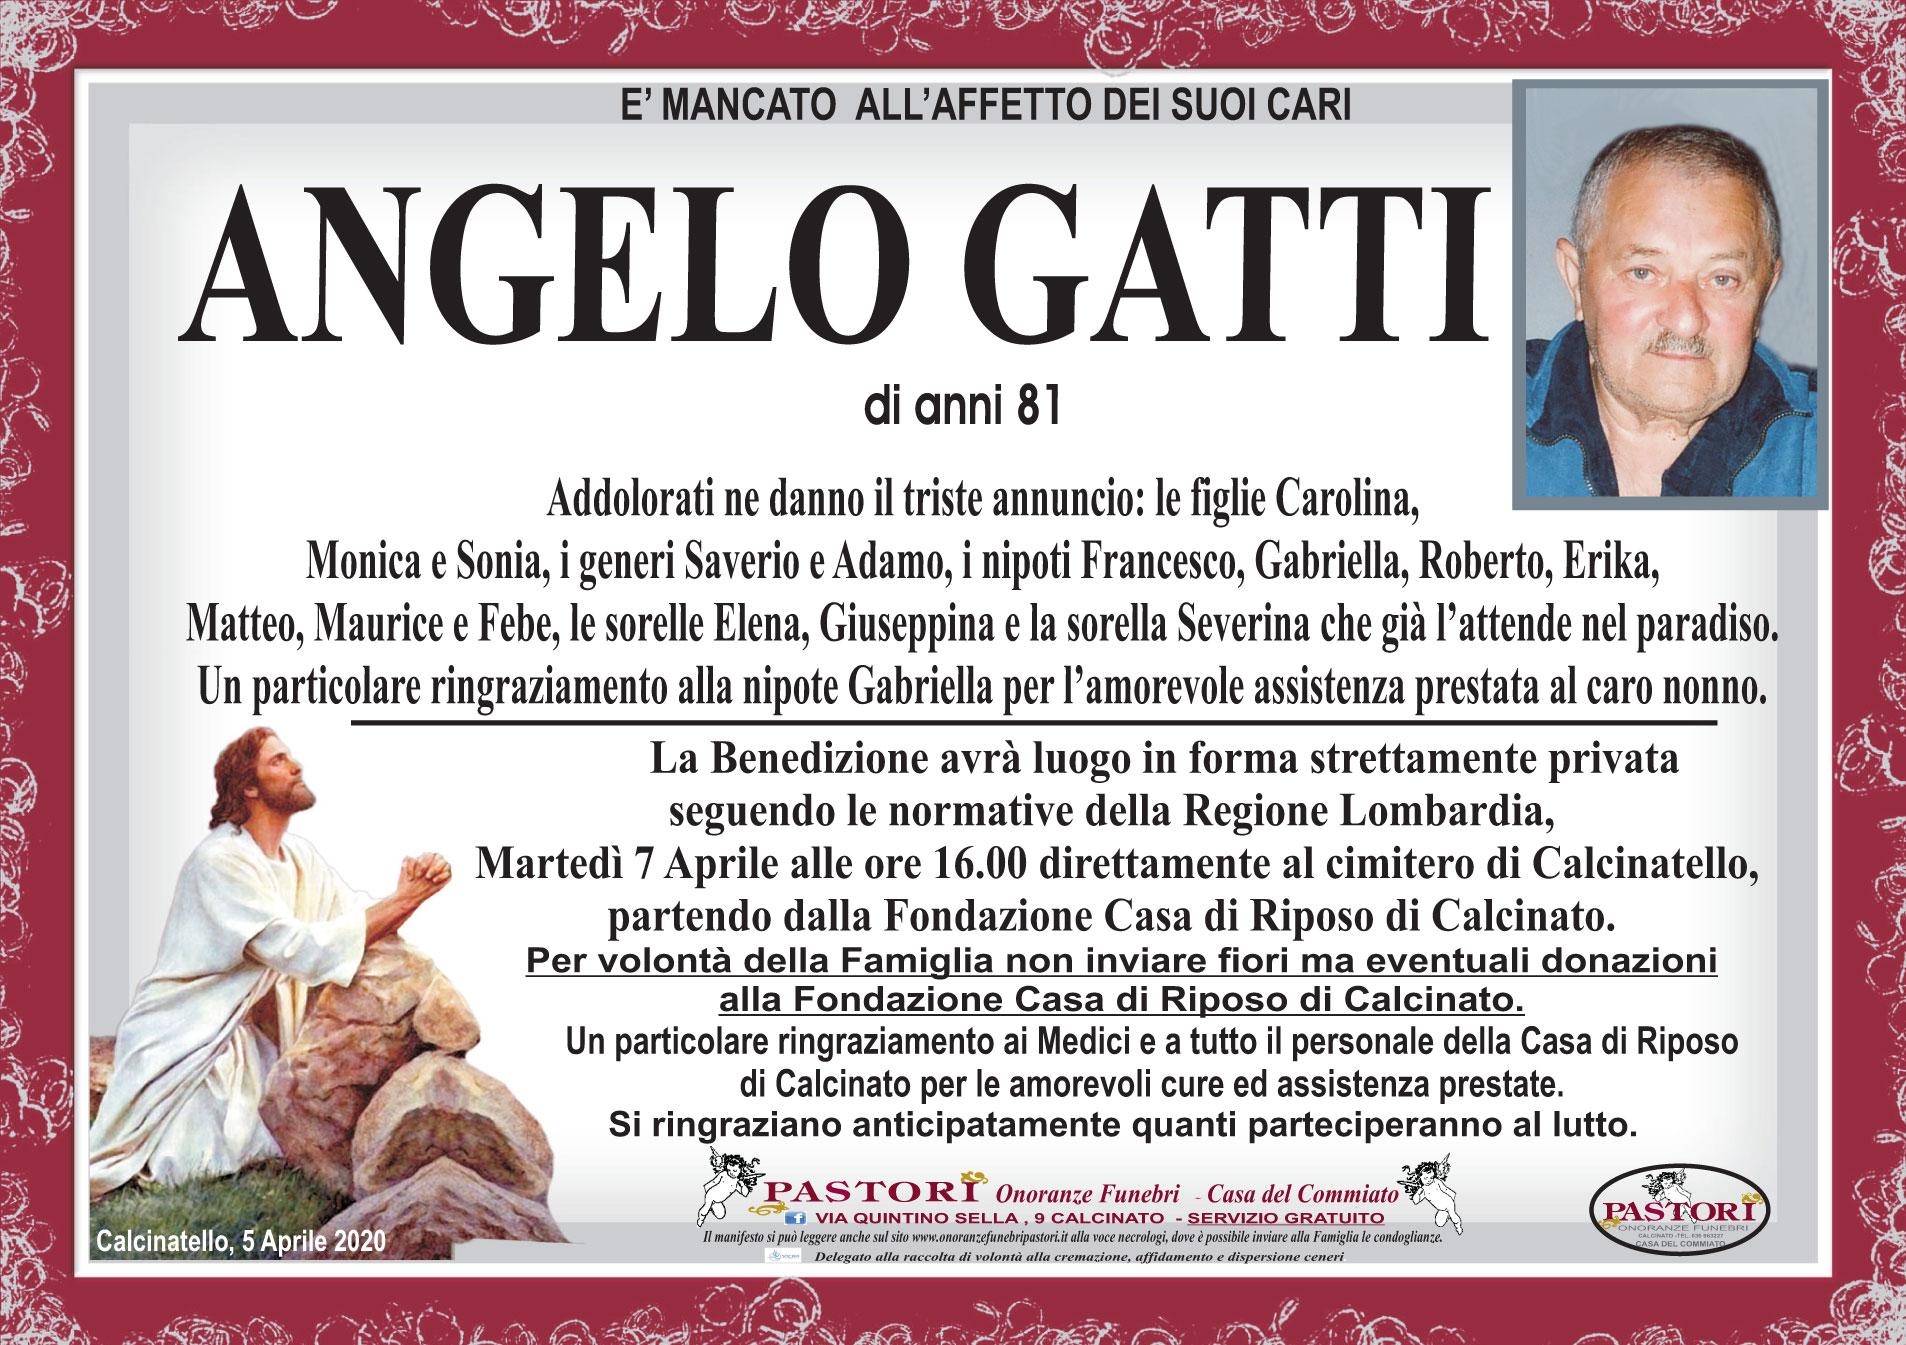 Angelo Gatti